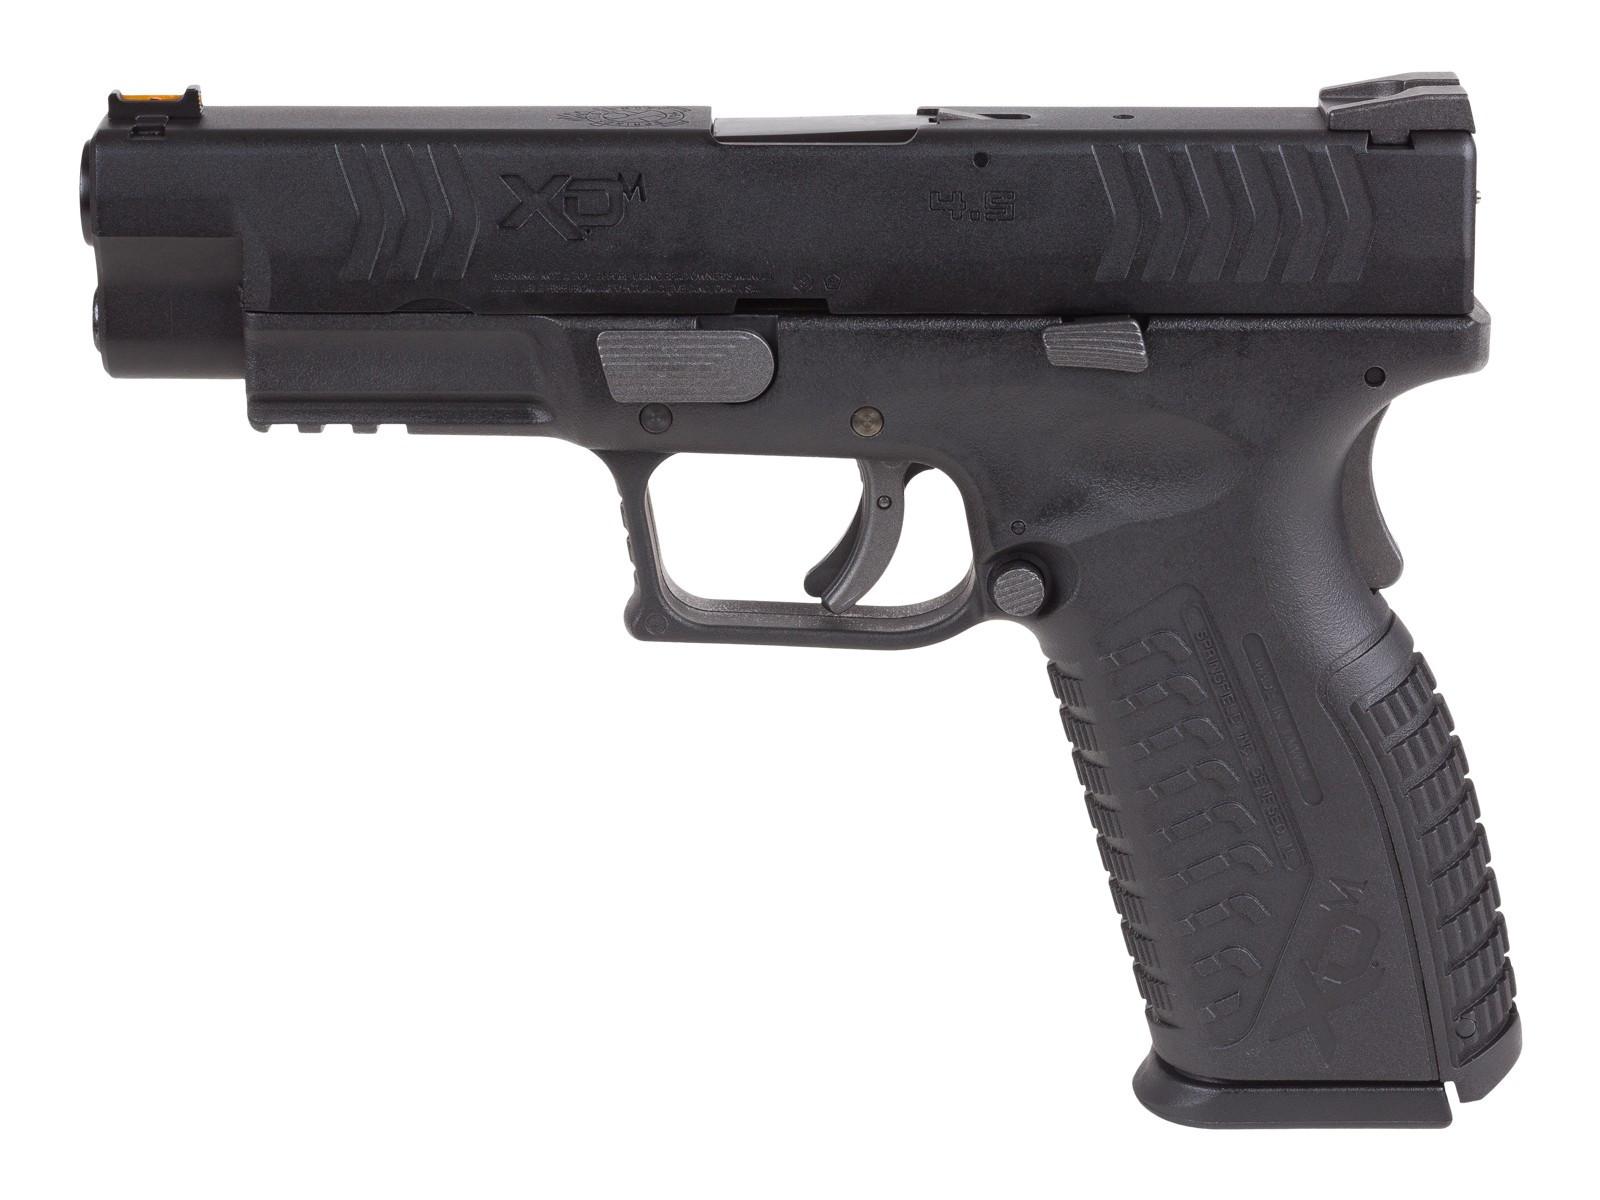 "Springfield Armory XDM 4.5"" .177 cal. CO2 Blowback Air Pistol, Black"